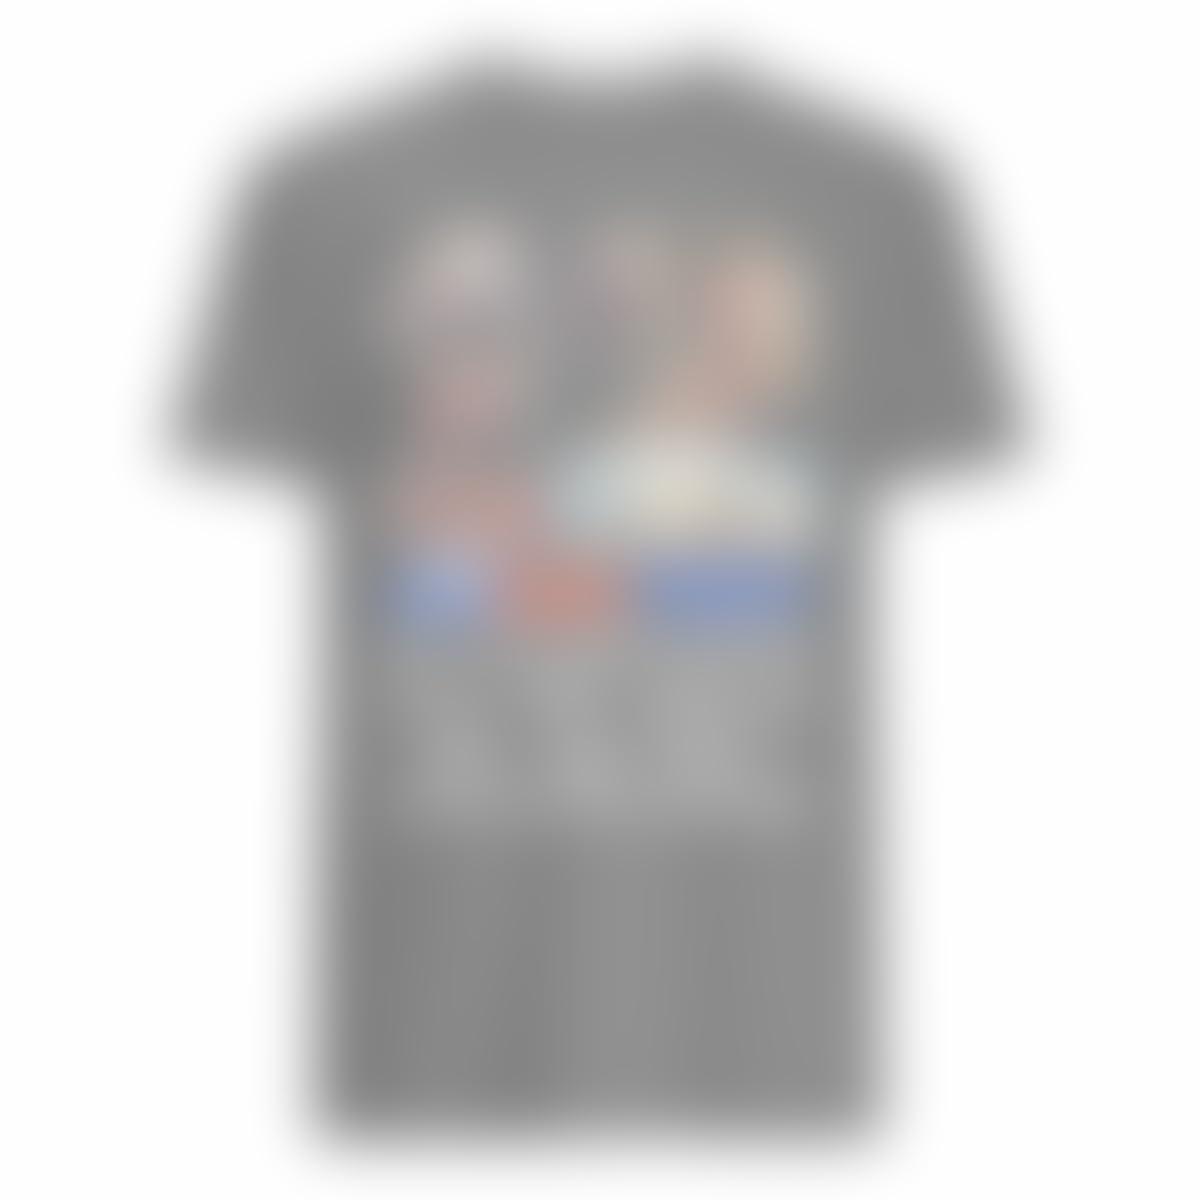 a312f8f8 Amazon.com: 12 years the Big Bang Theory thank you for the memories T-shirts  Sweatshirts Hoodies Longsleeve: Handmade